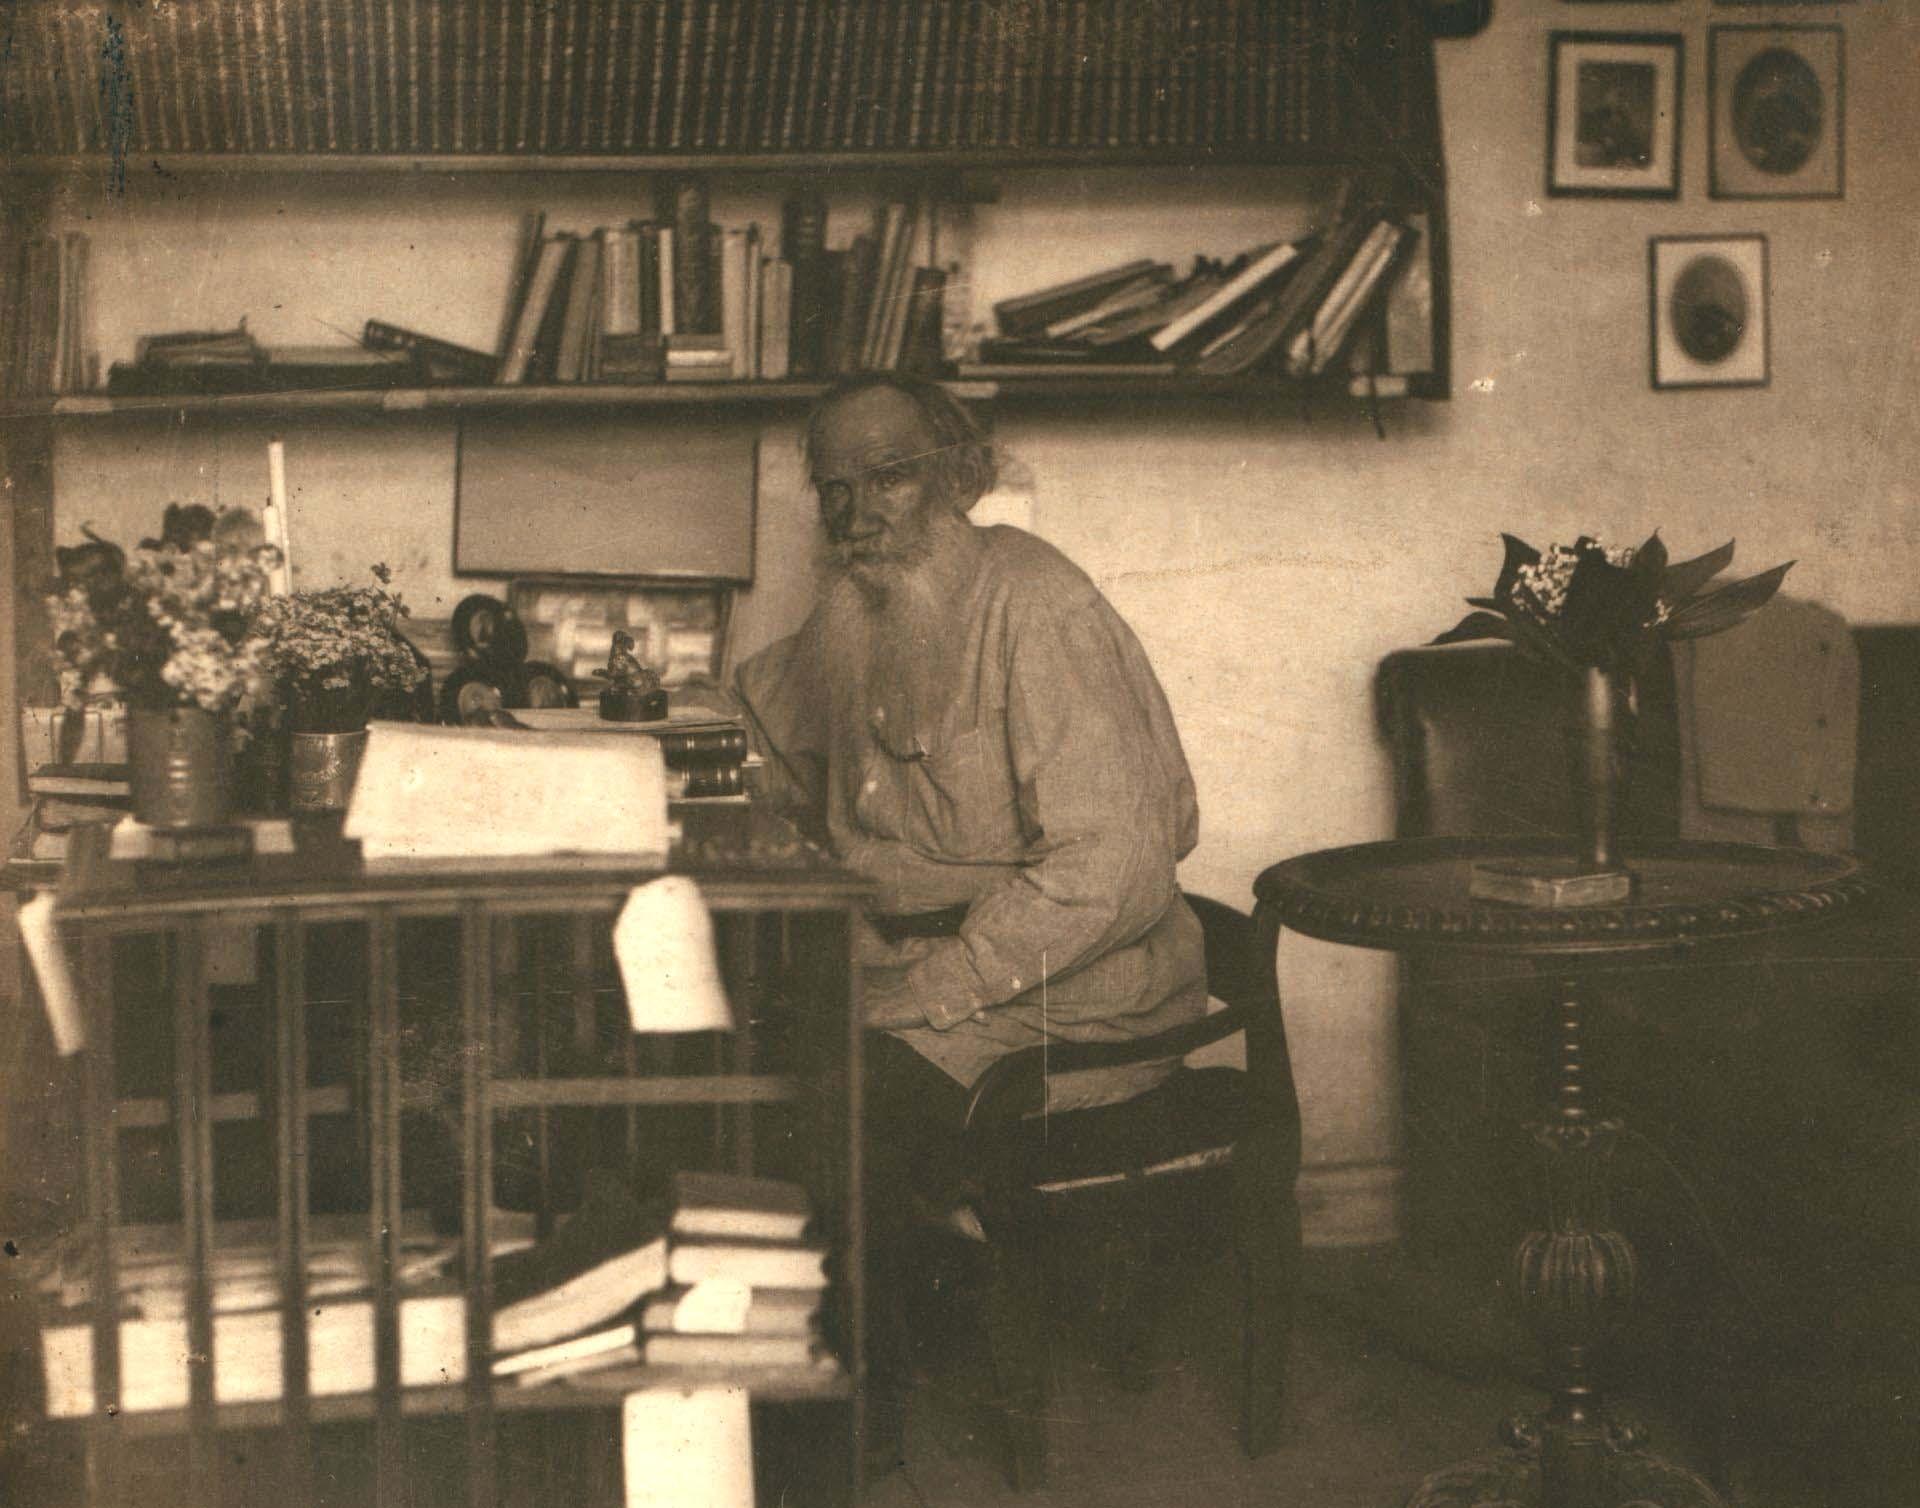 Tolstoy-yalnizlik